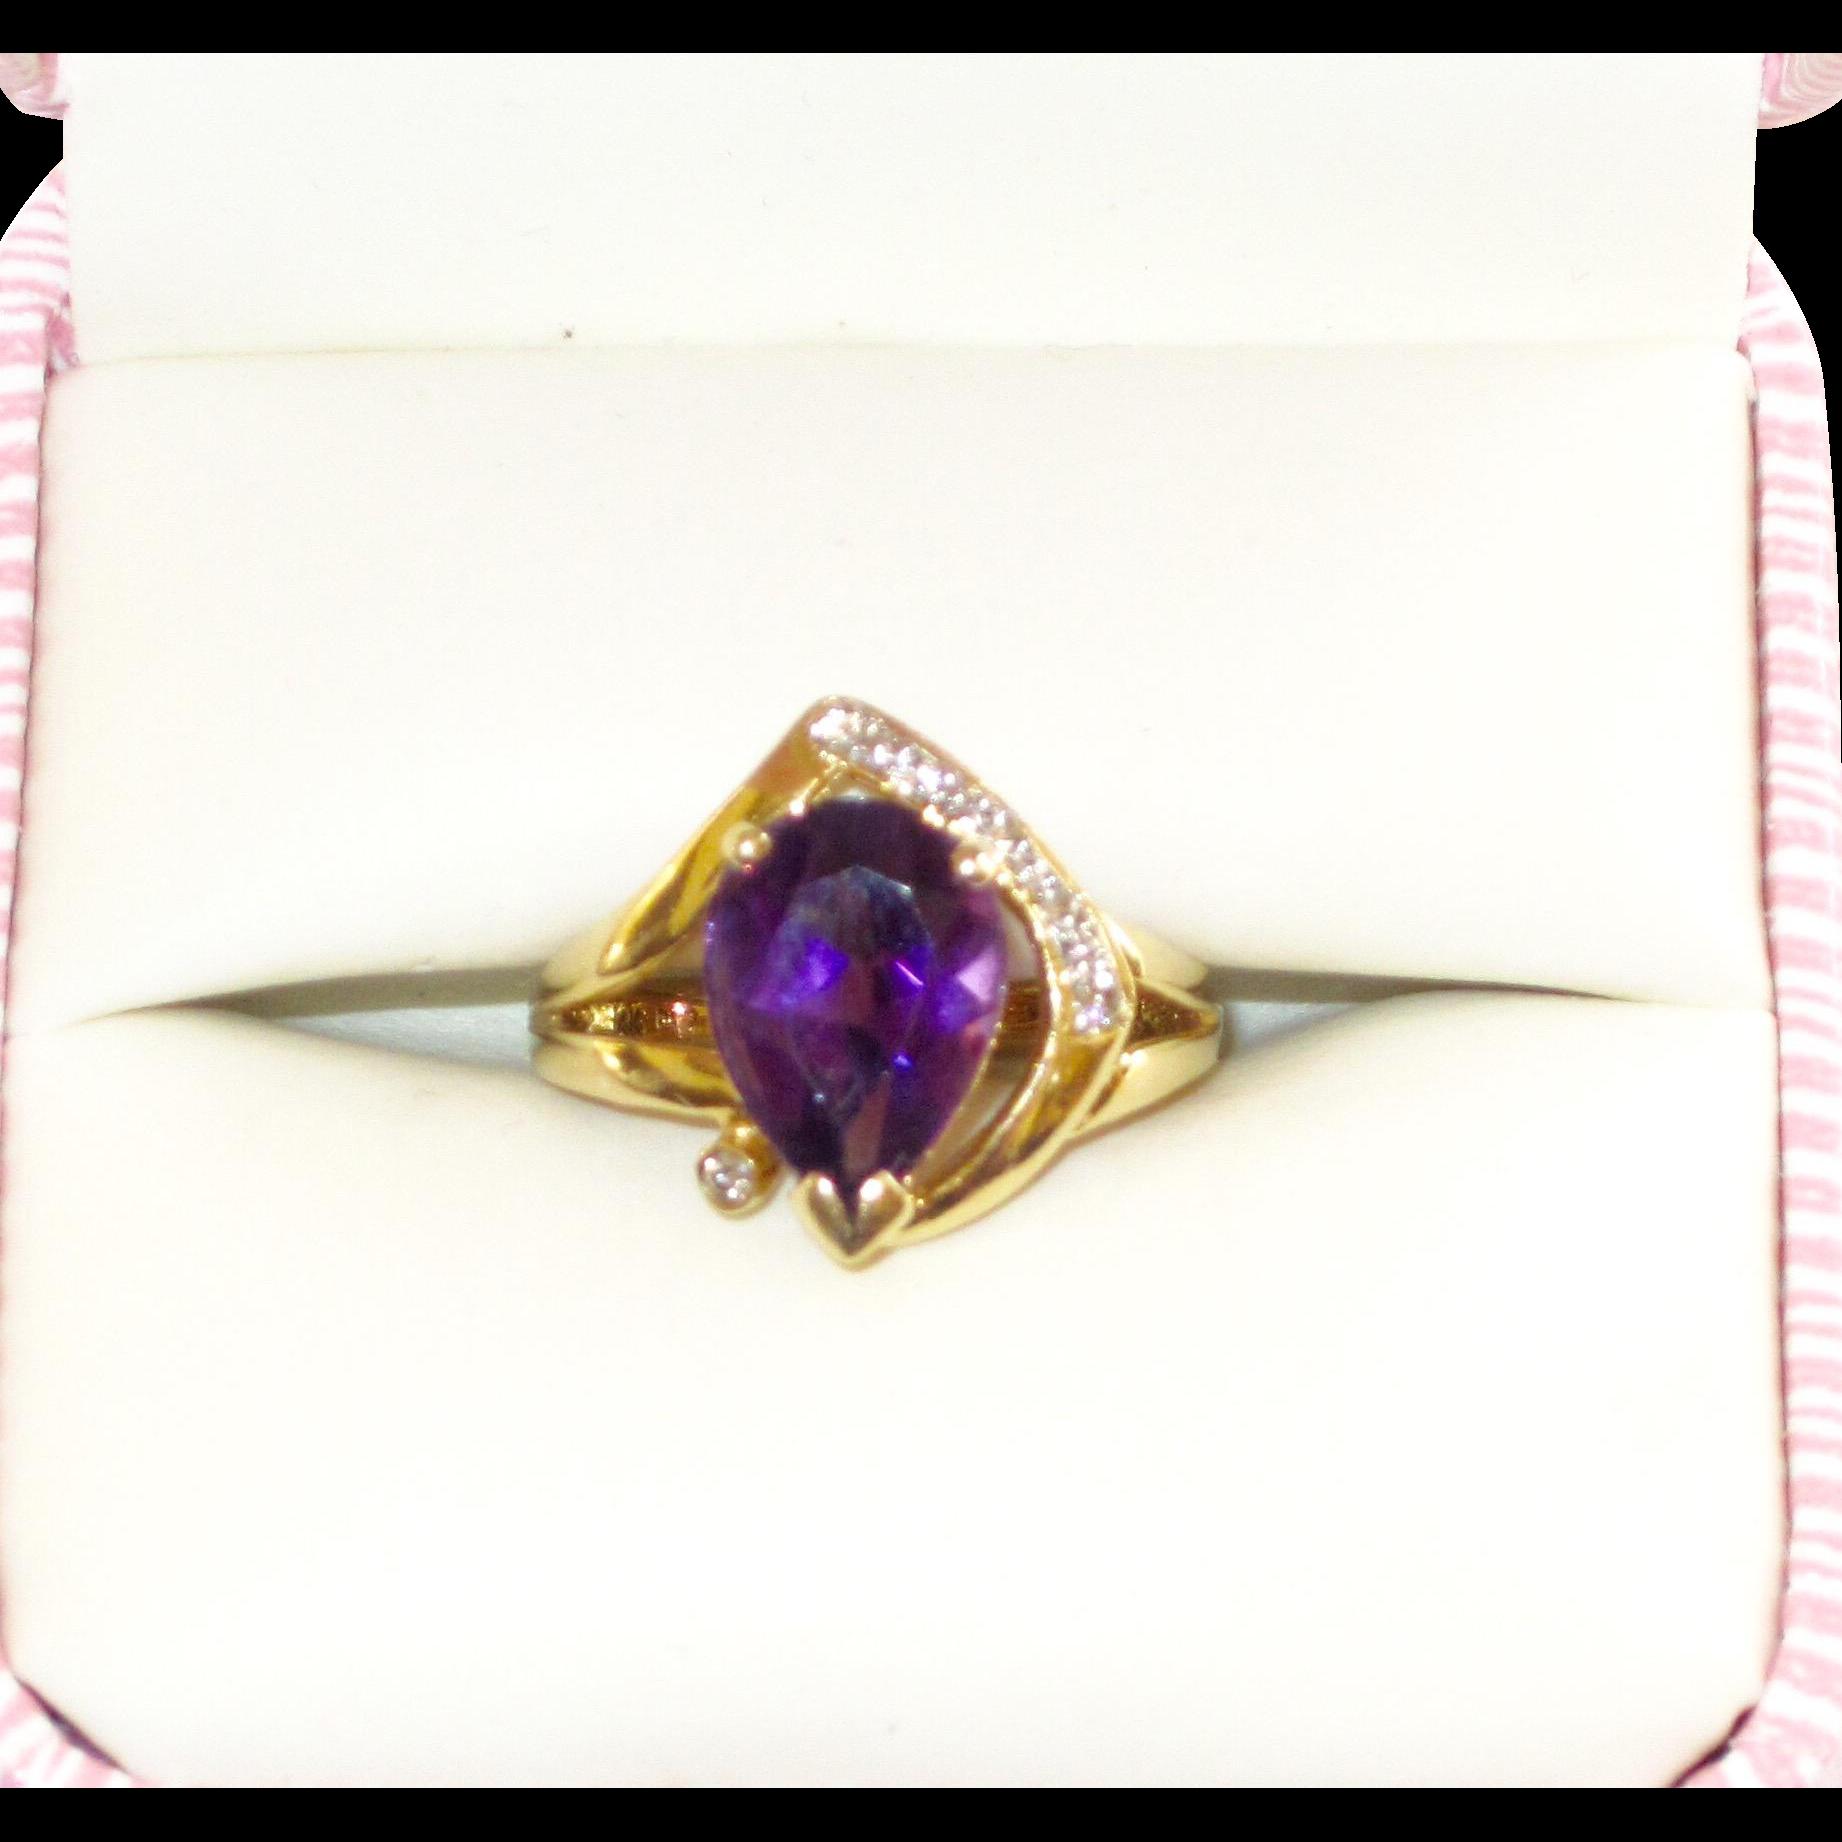 estate 14k 585 gold amethyst ring from phalan on ruby